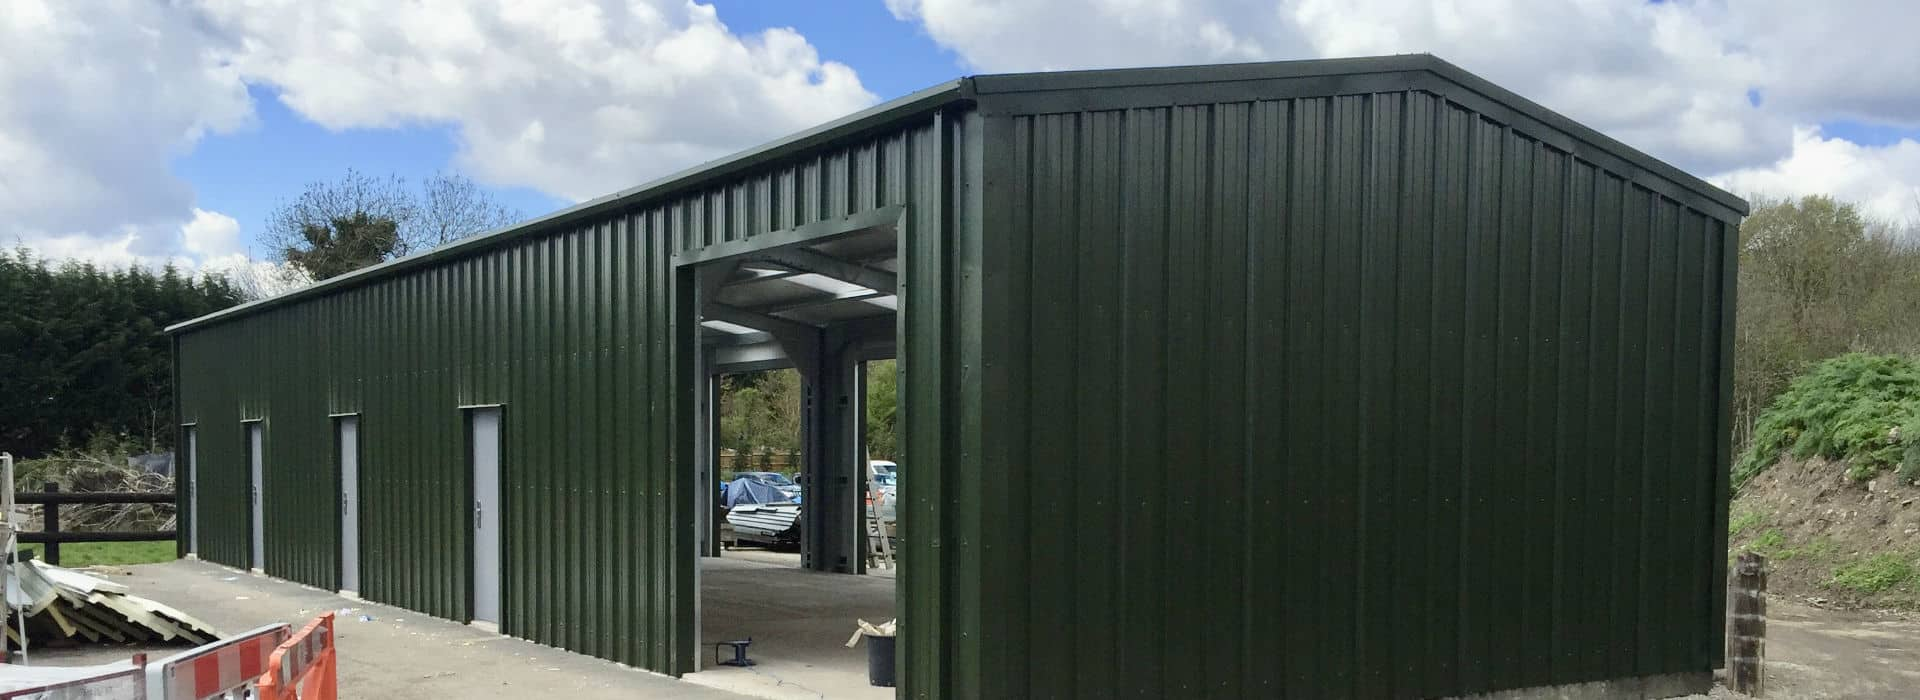 Steel Buildings International - Design, Supply & Installation UK Wide